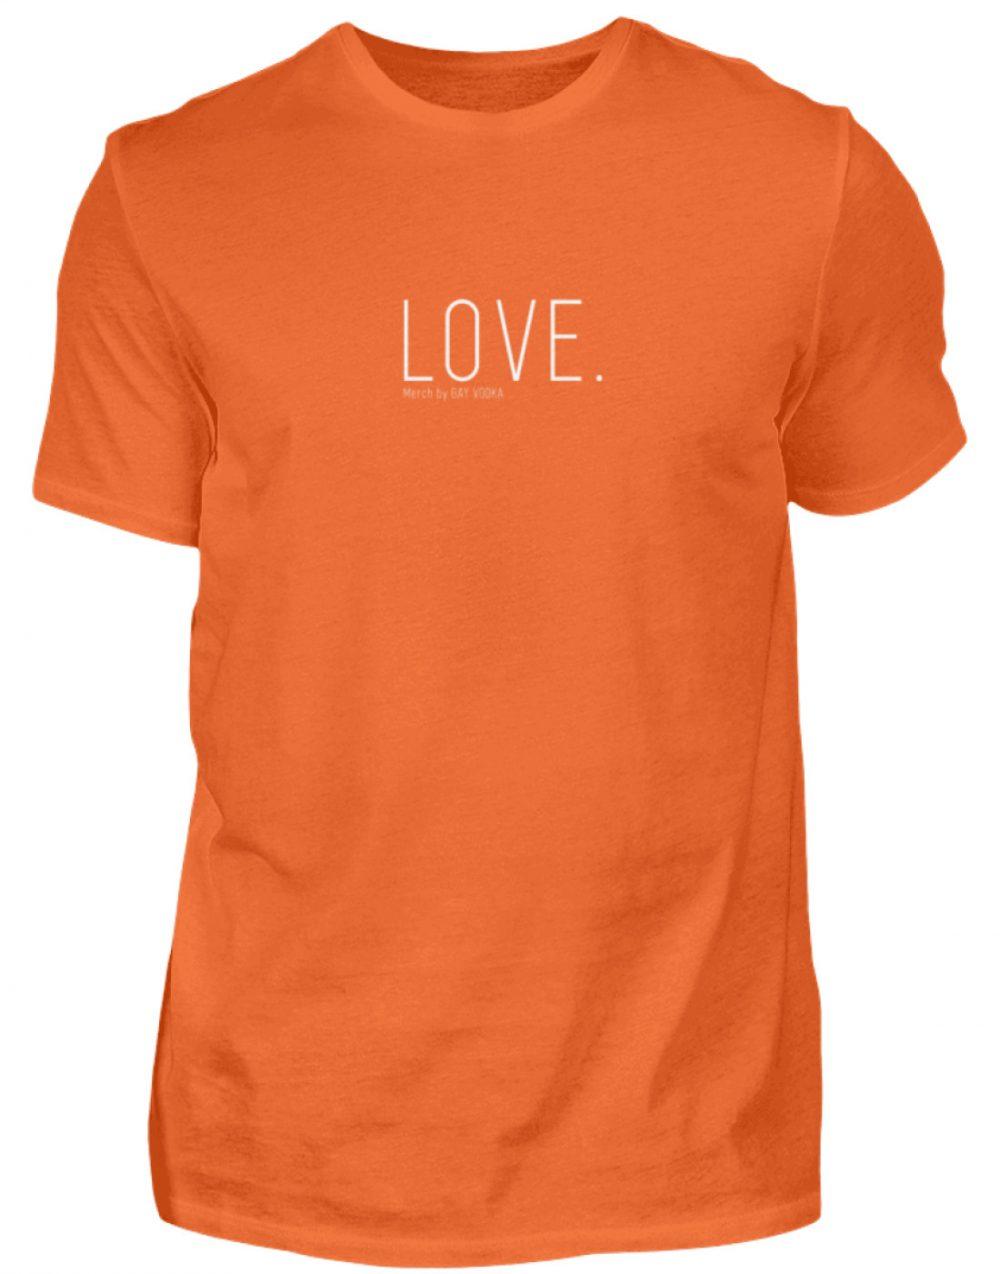 LOVE. - Herren Shirt-1692